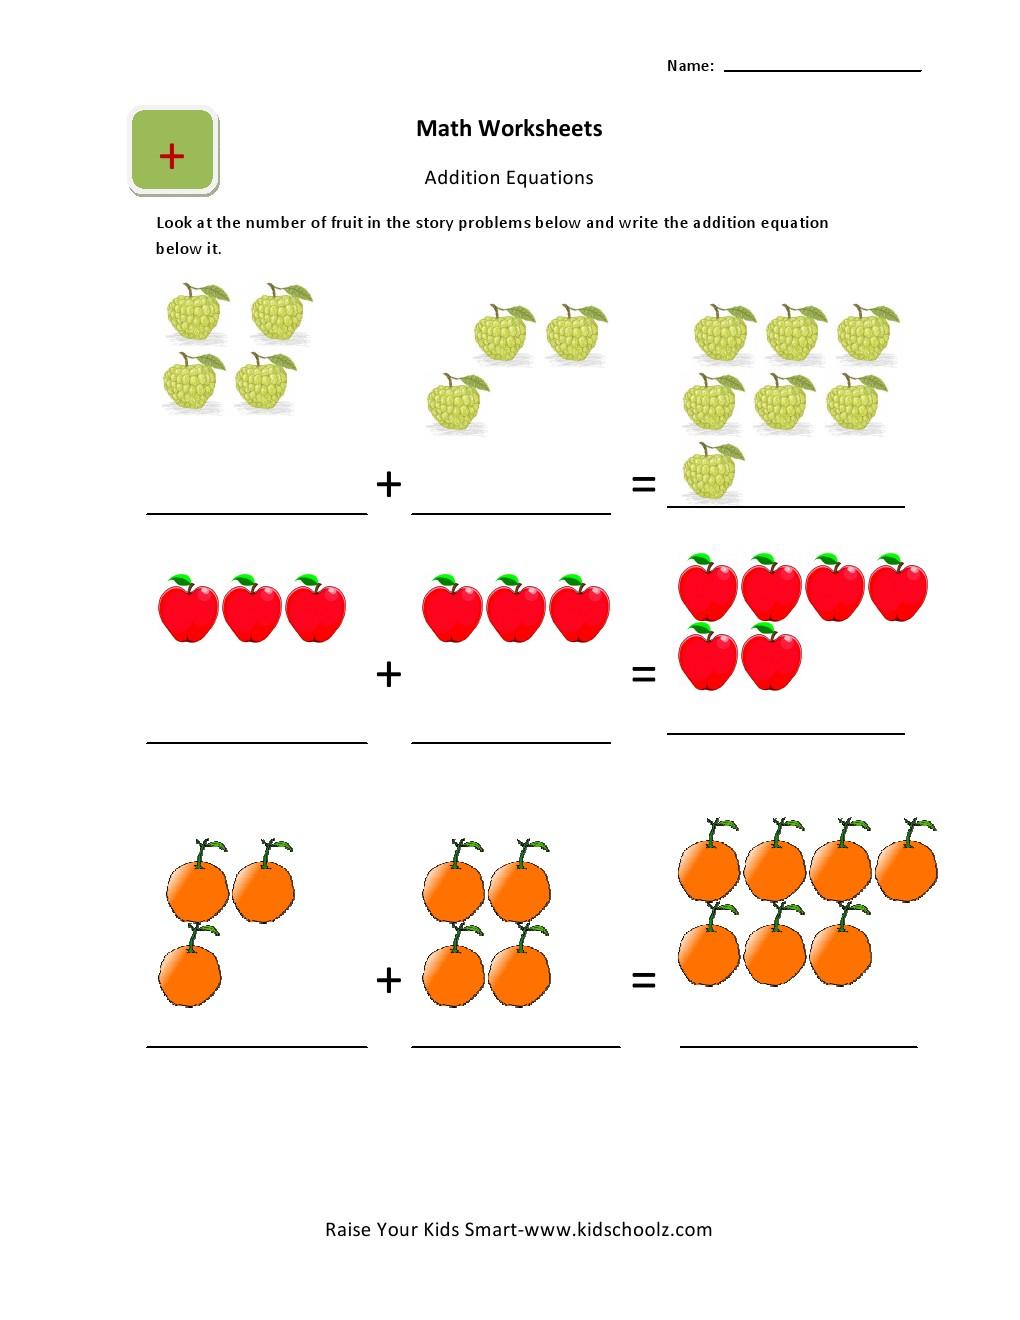 Picture Additionets Math For Preschoolers Ukg Kids Workshhetset